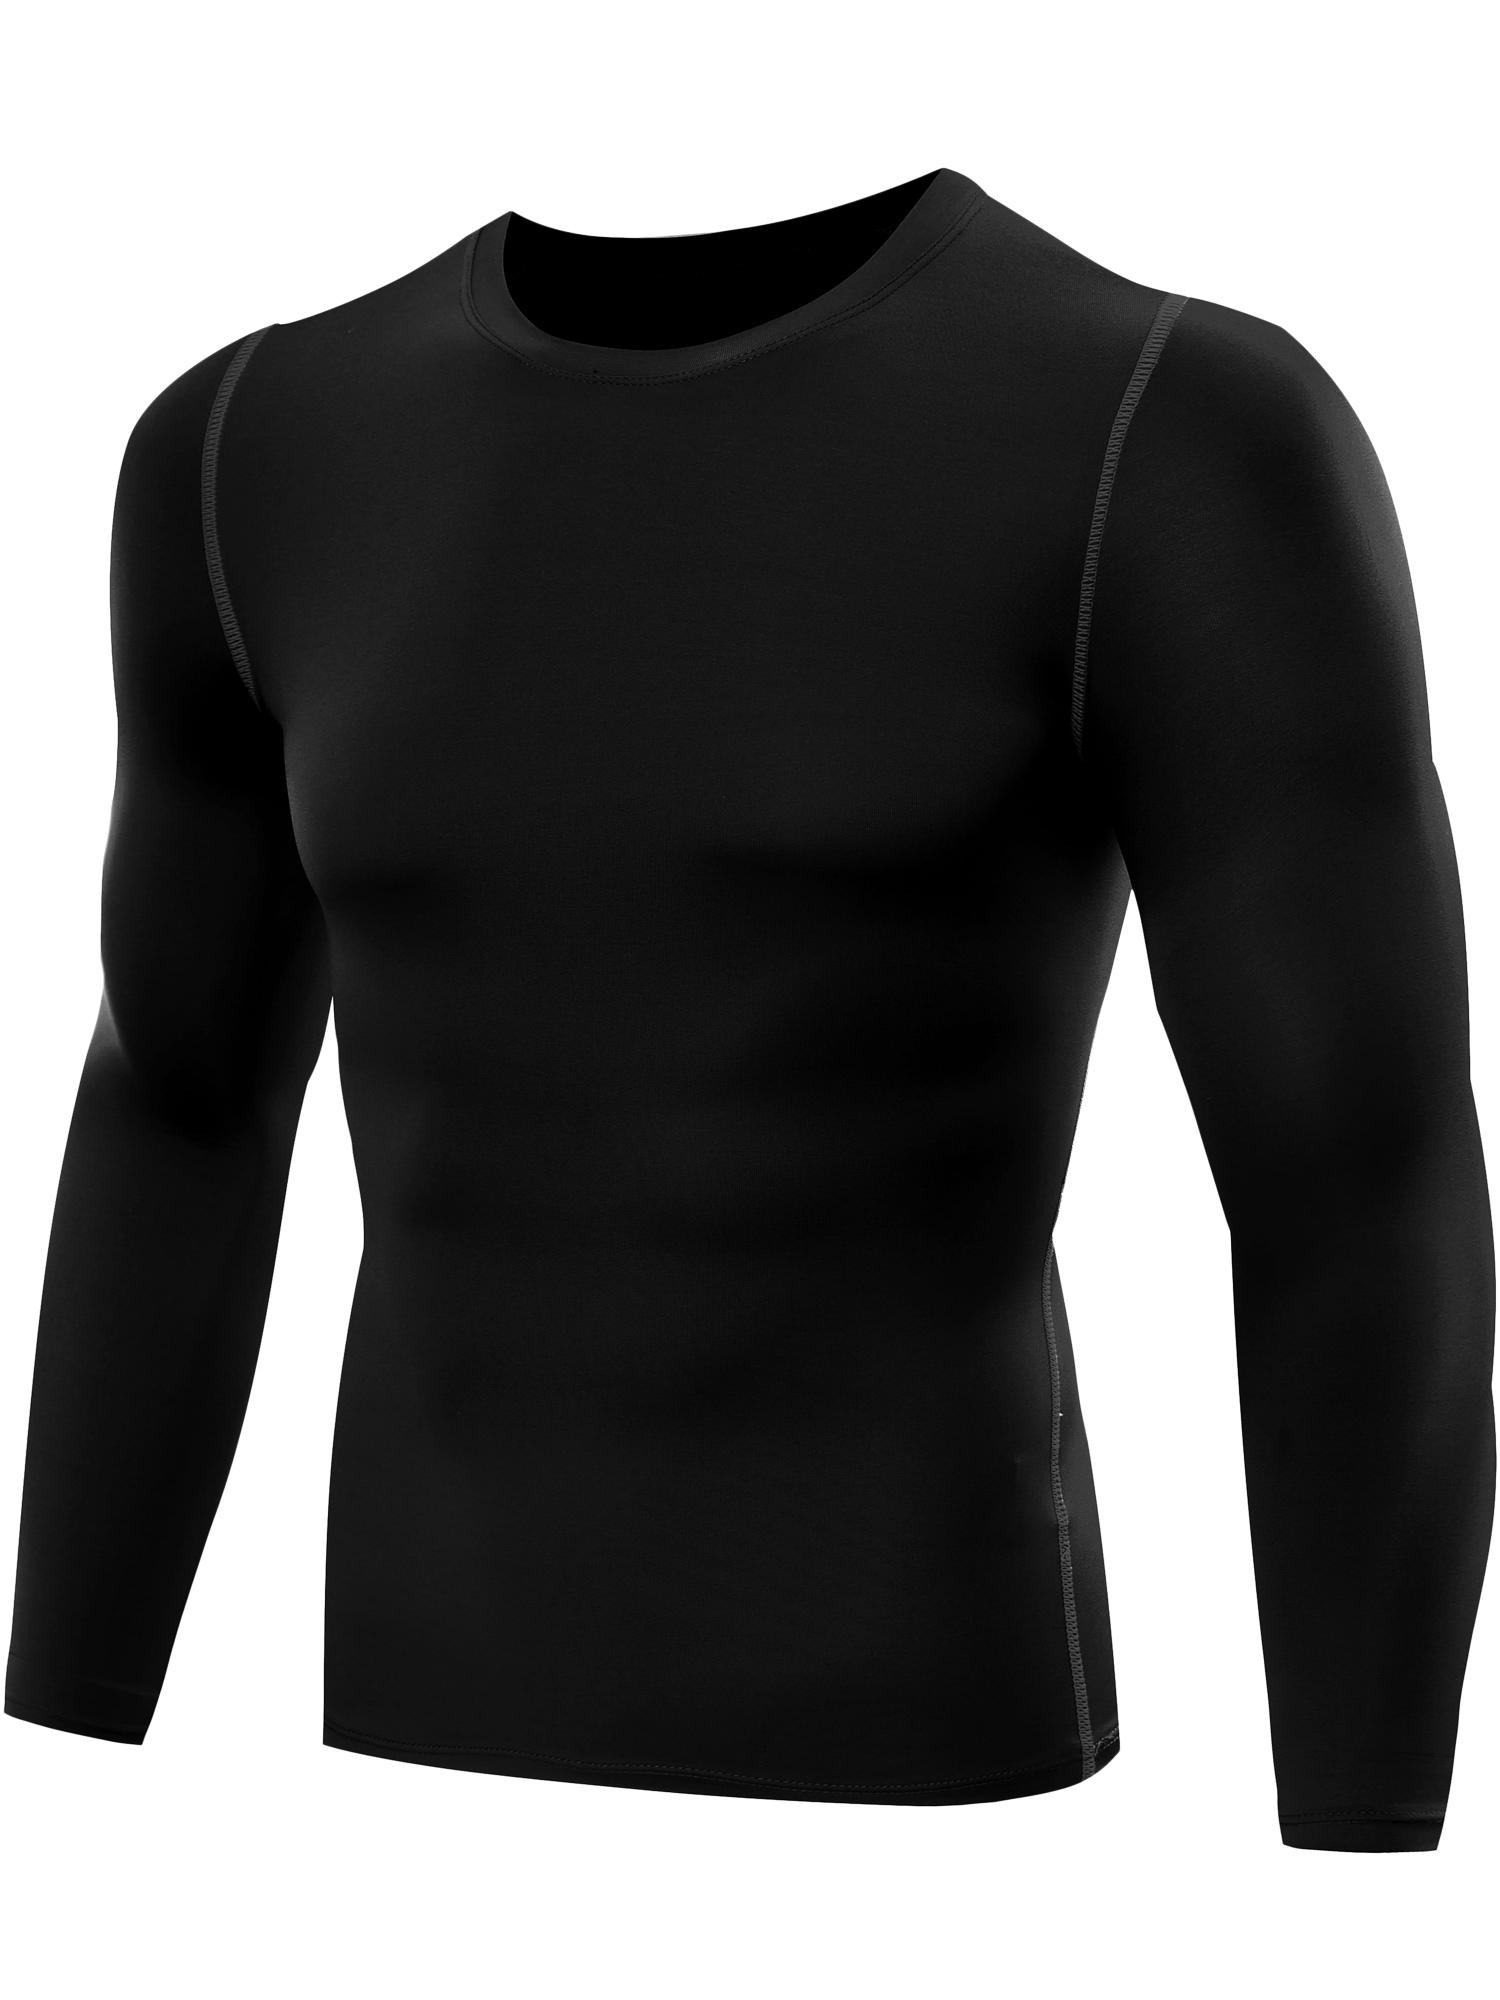 a5e9df182e69 ... DT0008 Neleus Men's Compression Sport Running Base Layer Long Sleeve T  Shirt ...